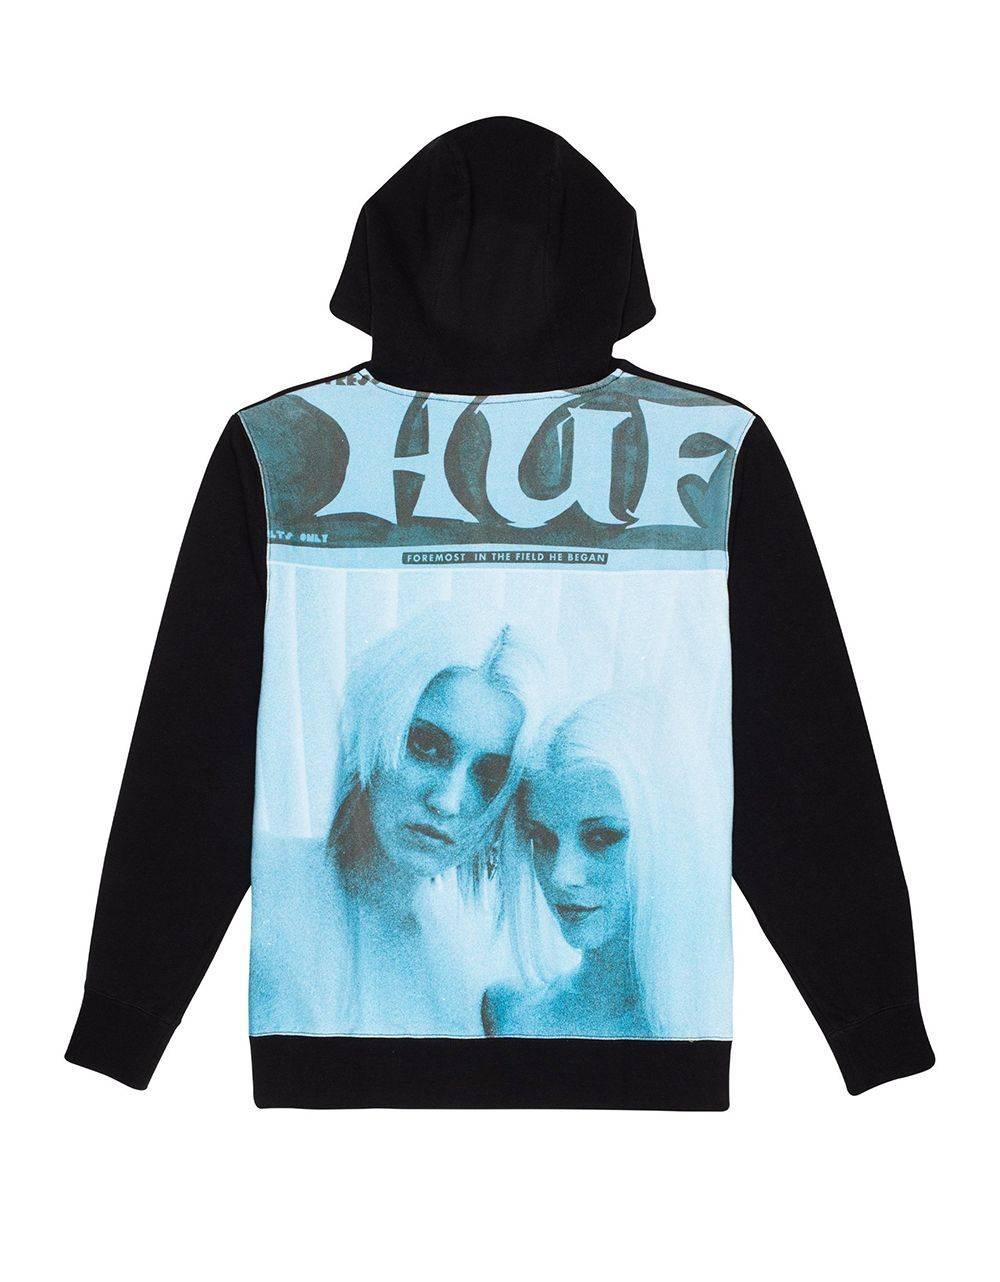 Huf Vivid P/O fleece - black Huf Sweater 125,00€